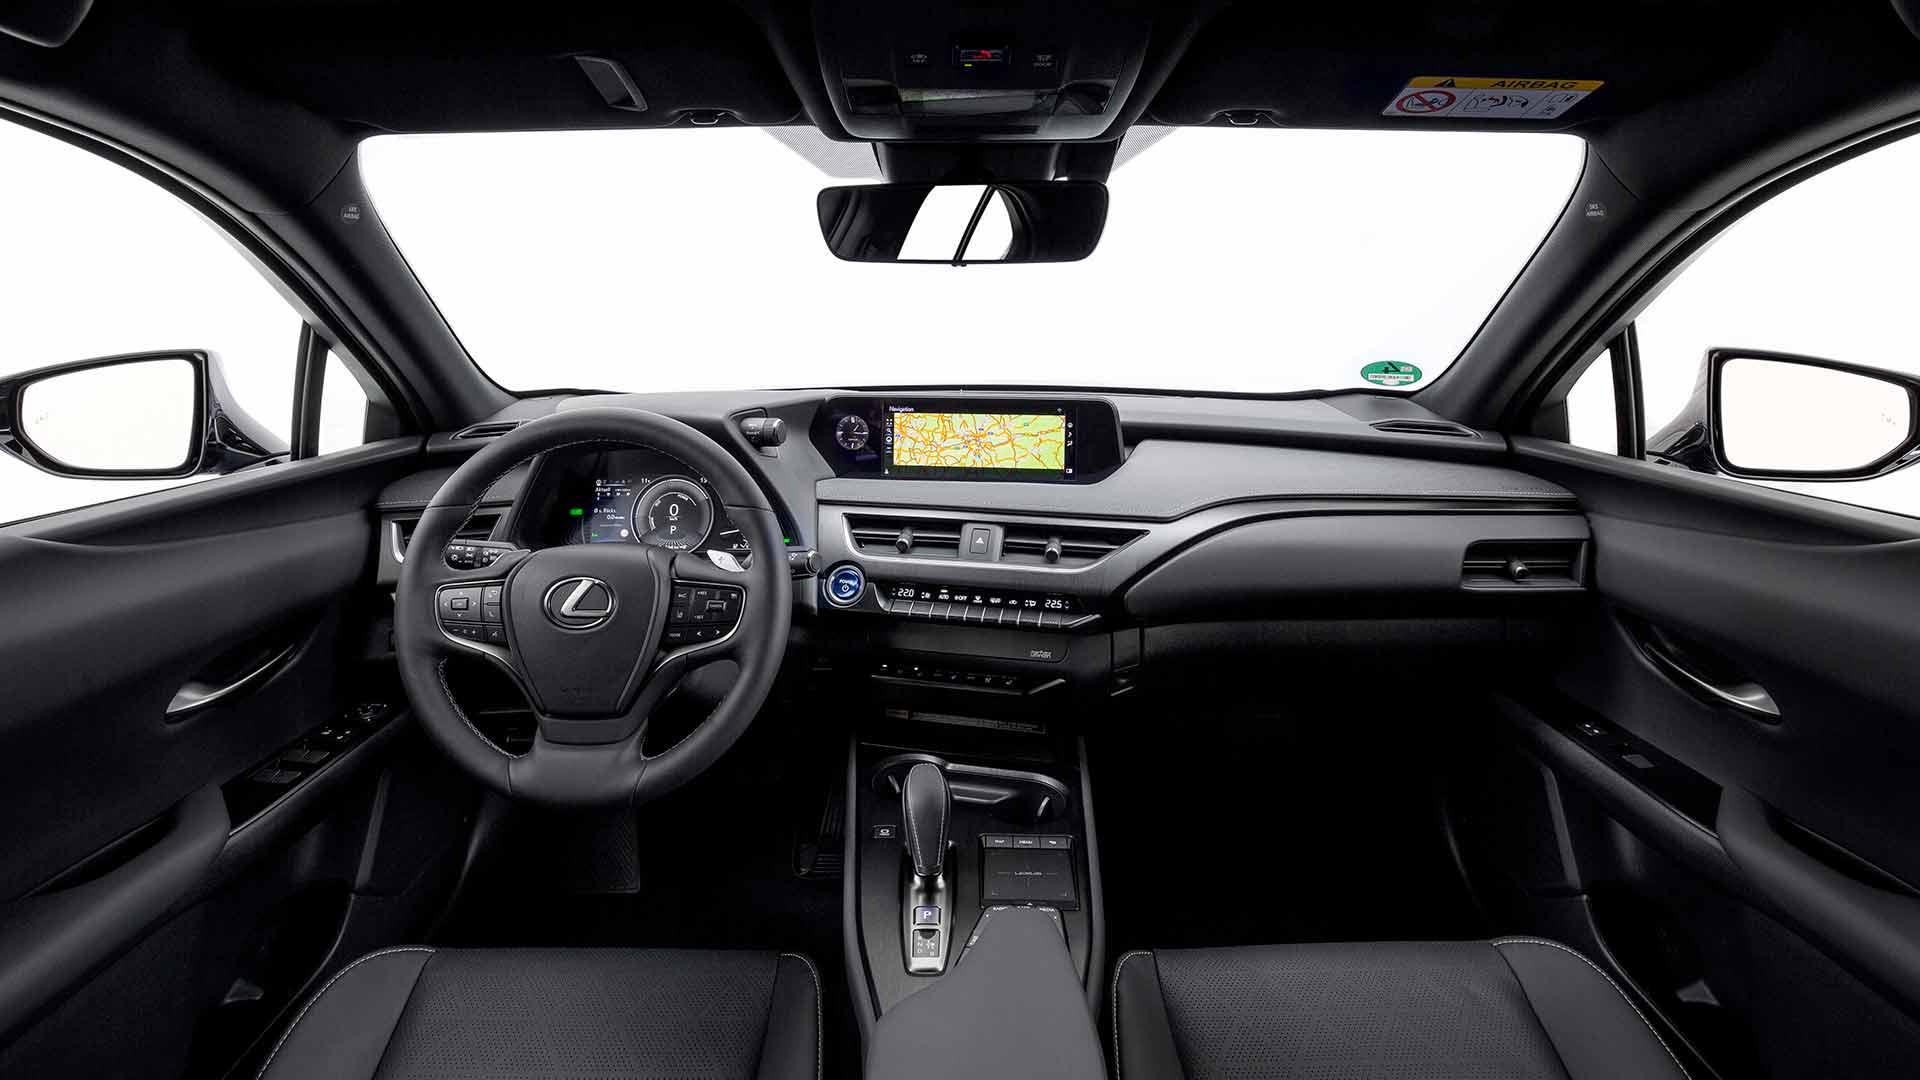 Lexus UX300e Deutschlandpremiere Longbody Image 7 1920x1080px